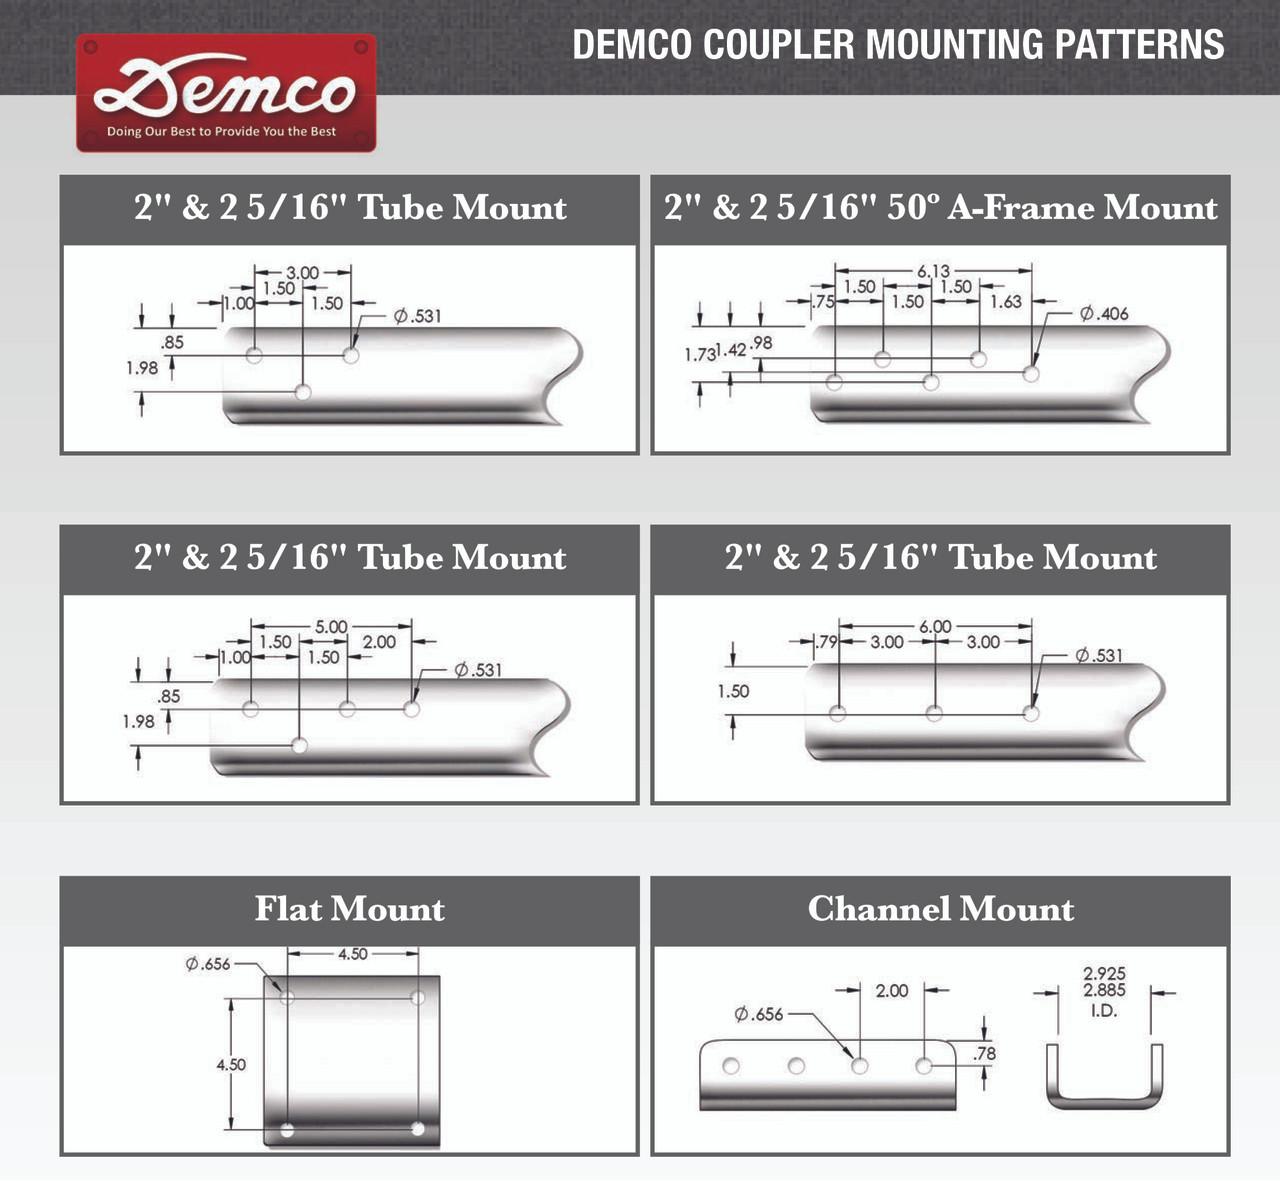 "14793-81 --- Demco eZ Latch A-Frame Coupler - 10,000 lb Capacity - 2"" - Black"